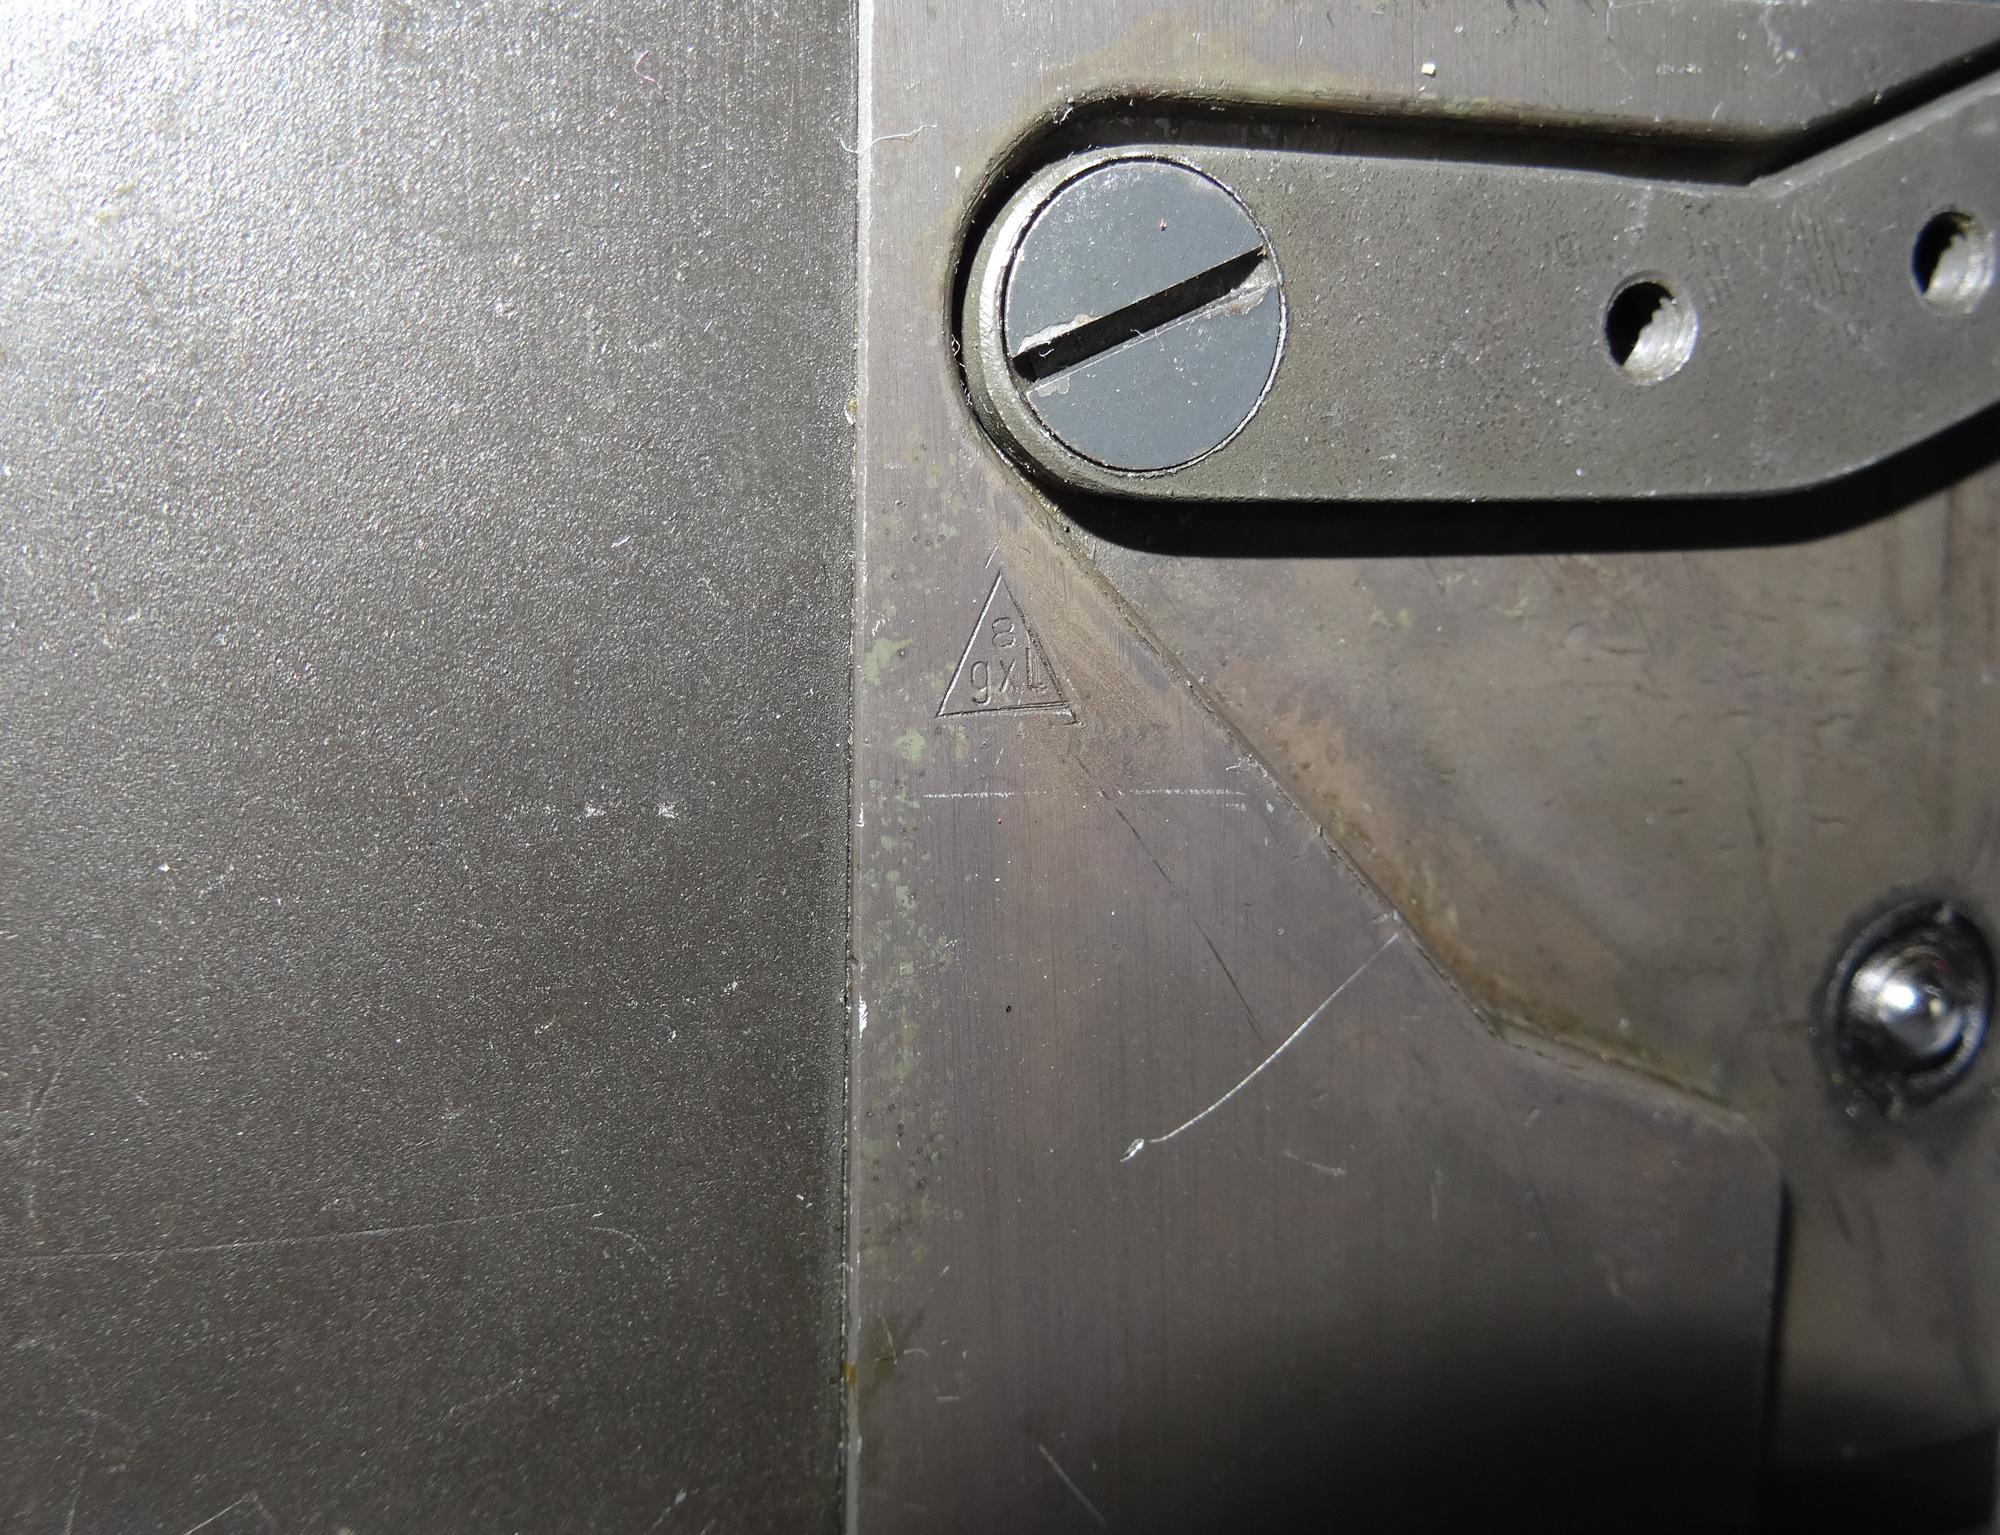 gxl - Hersteller Stempel